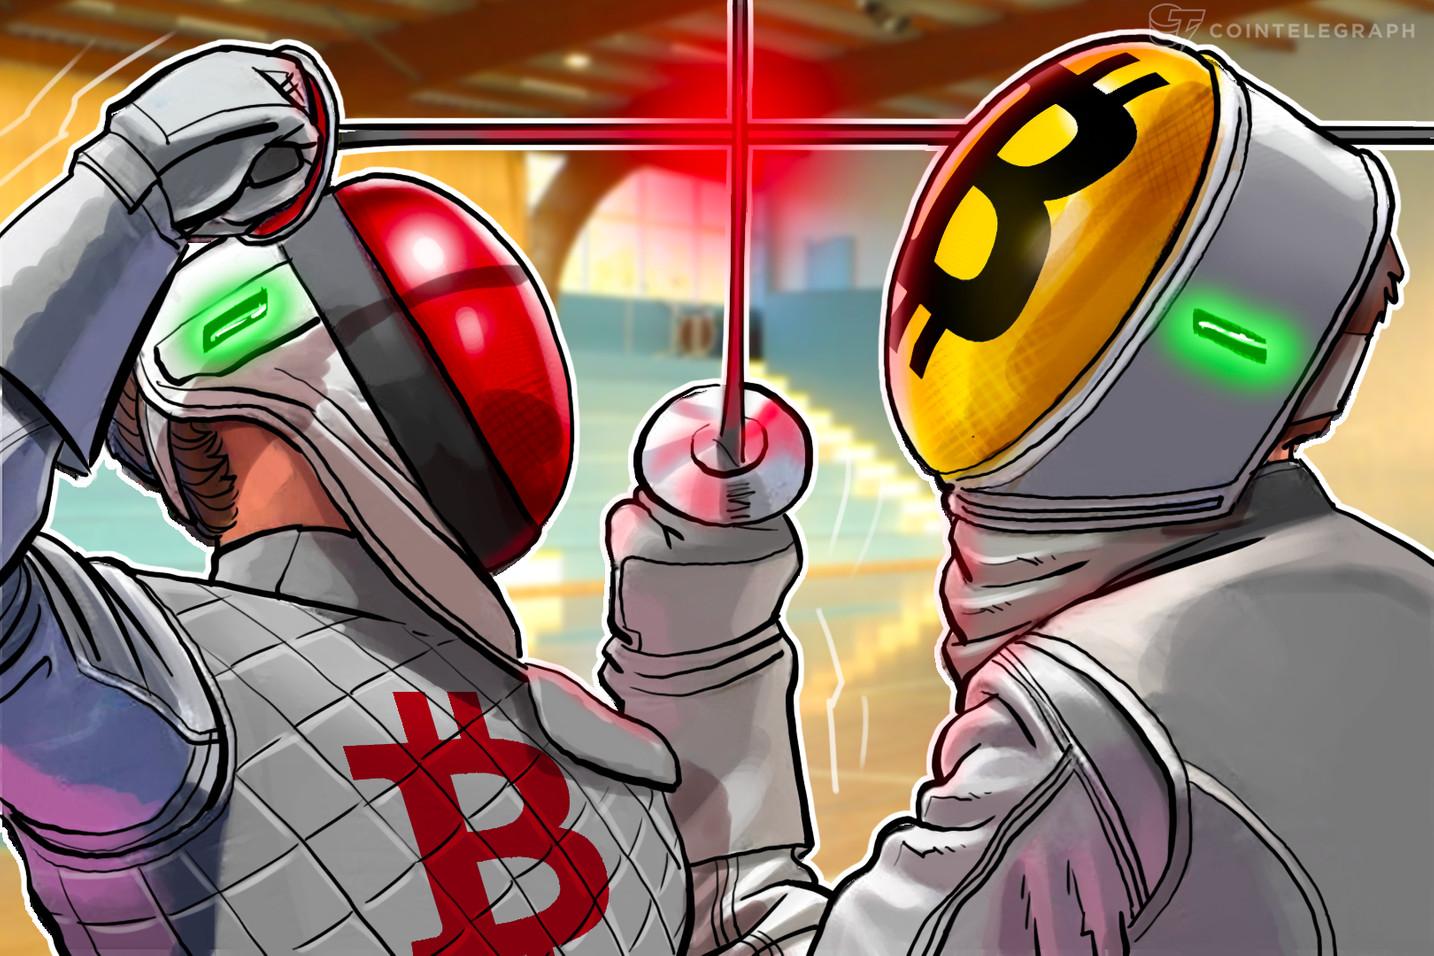 'Bitcoin já é mais rápido e mais barato do que Bitcoin Cash' diz especialista de Wall Street